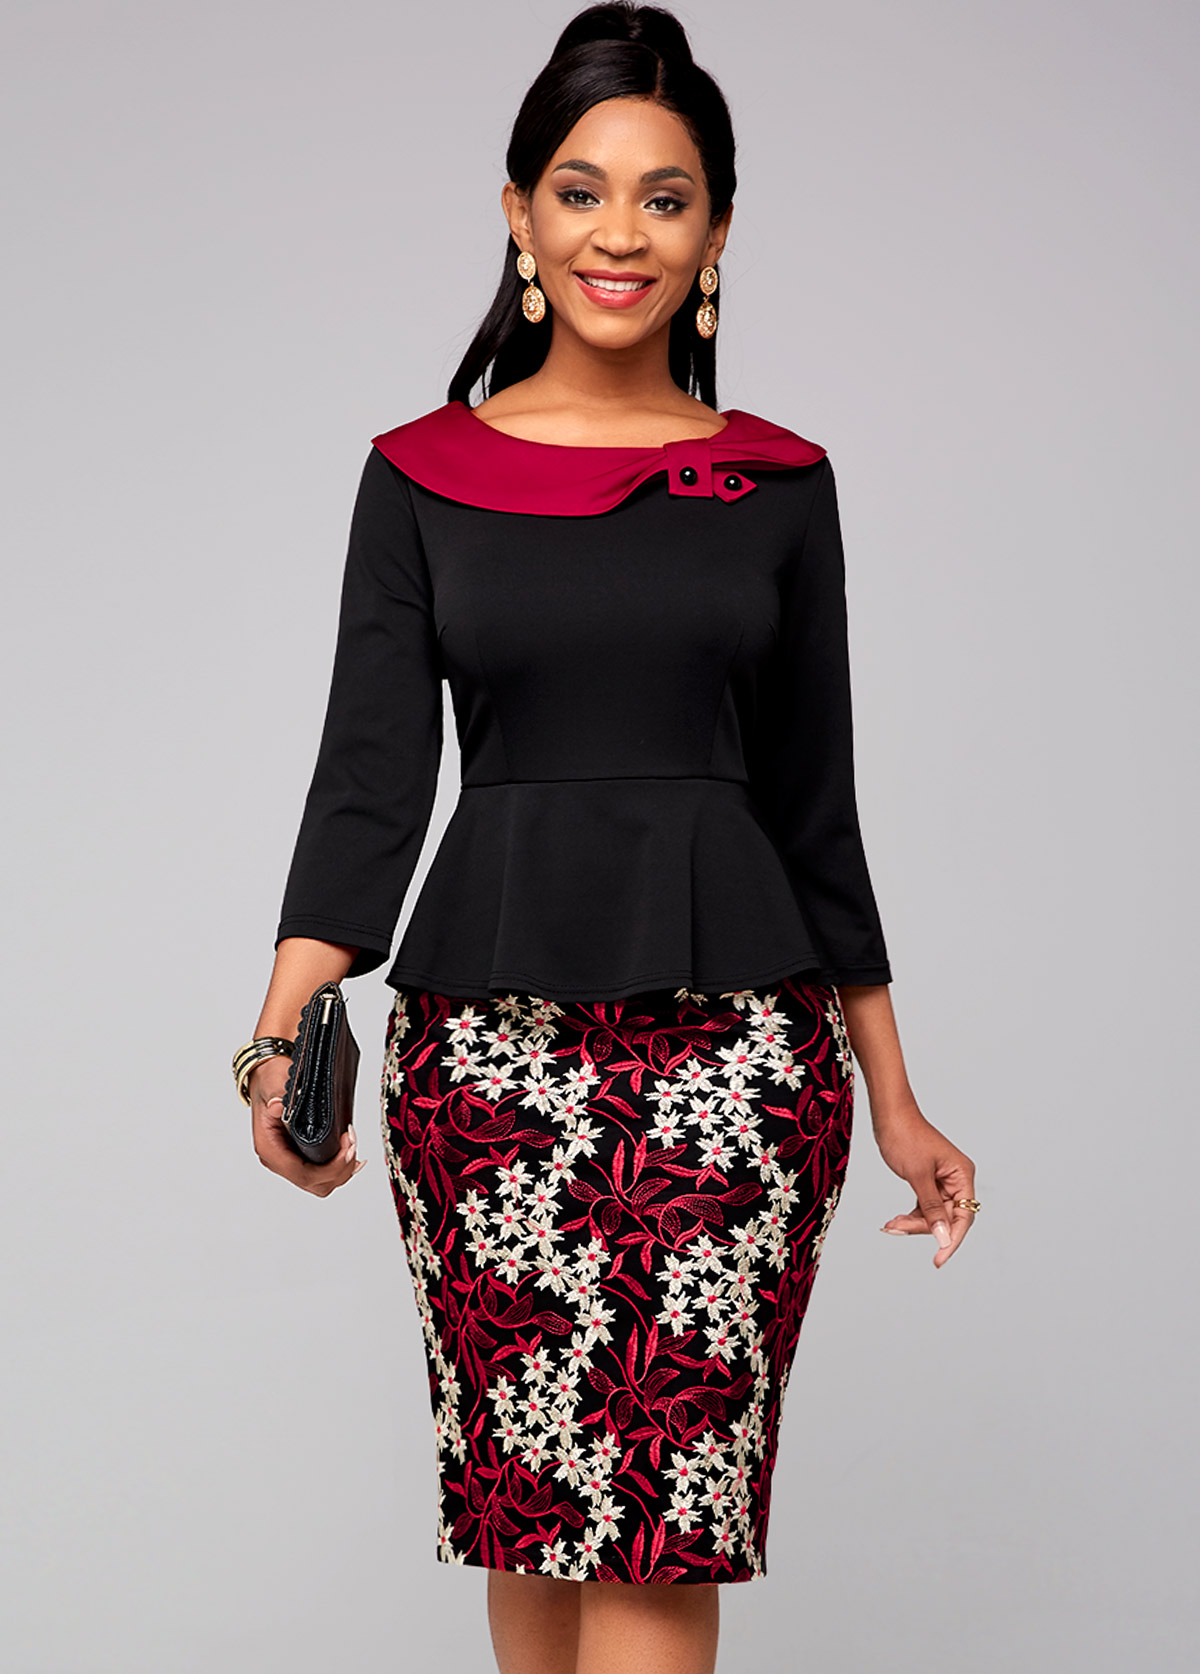 ROTITA Lace Stitching 3/4 Sleeve Contrast Dress